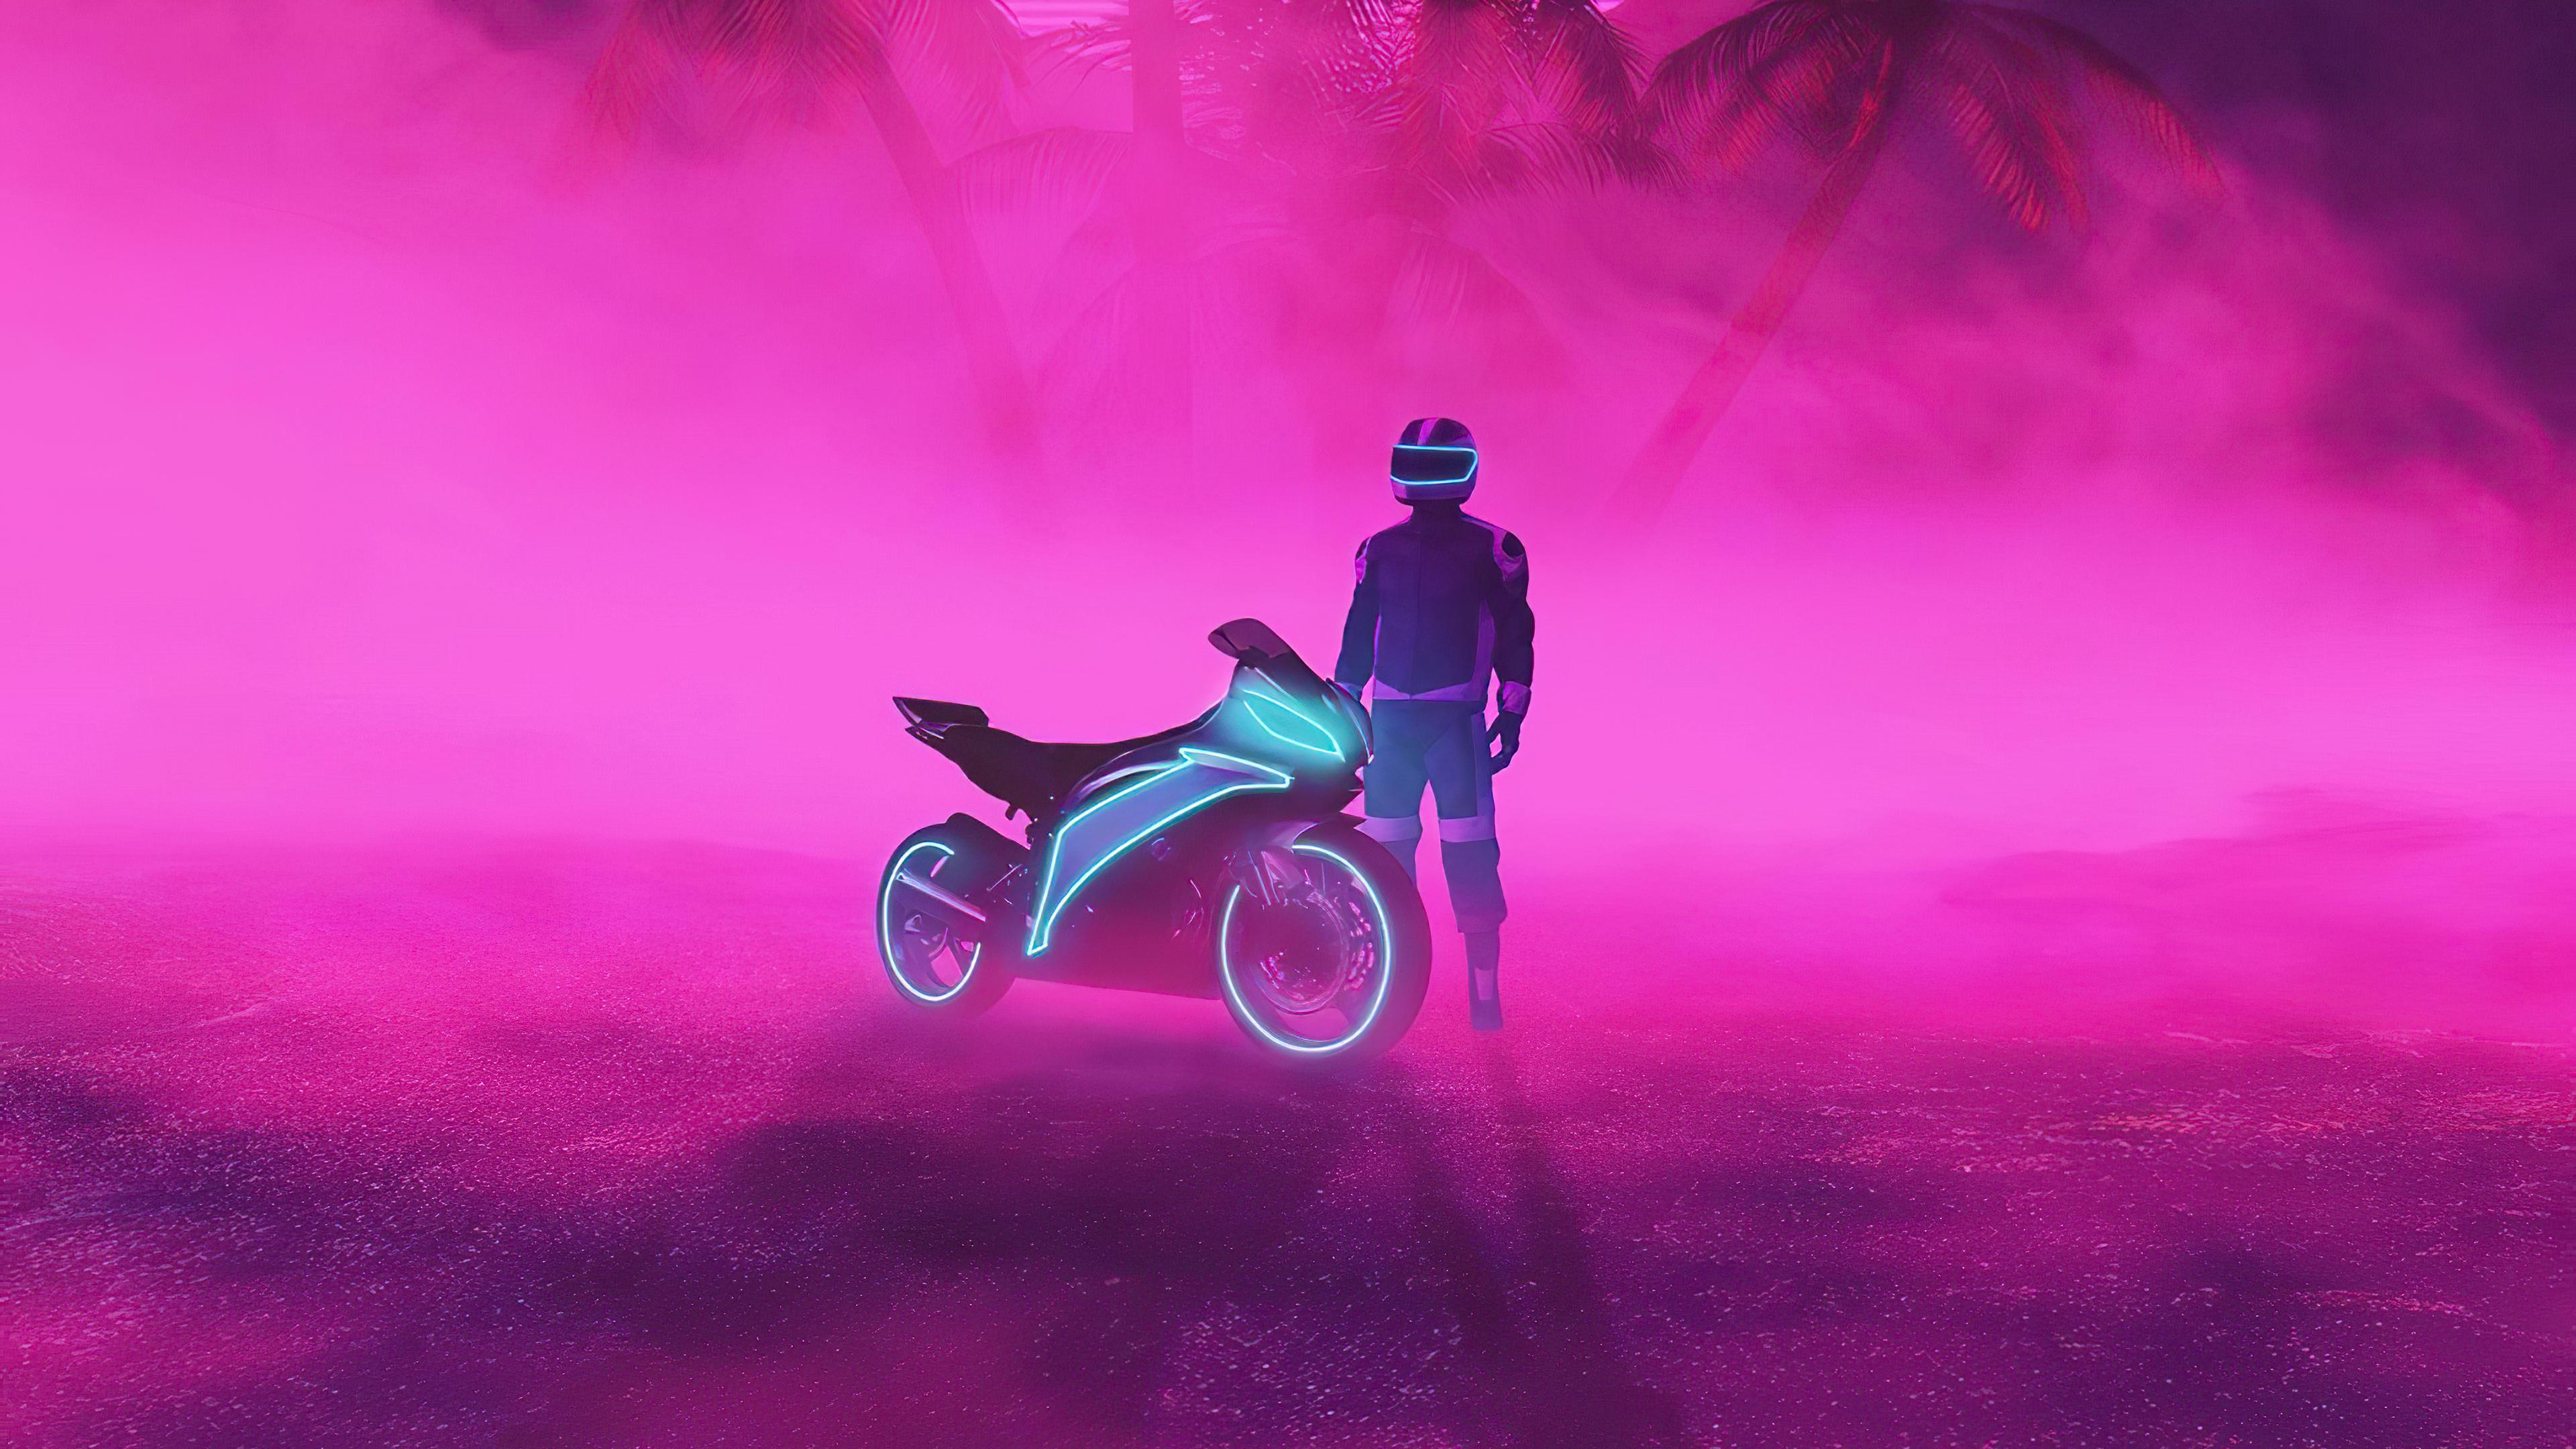 neon biker boy 1578254736 - Neon Biker Boy -